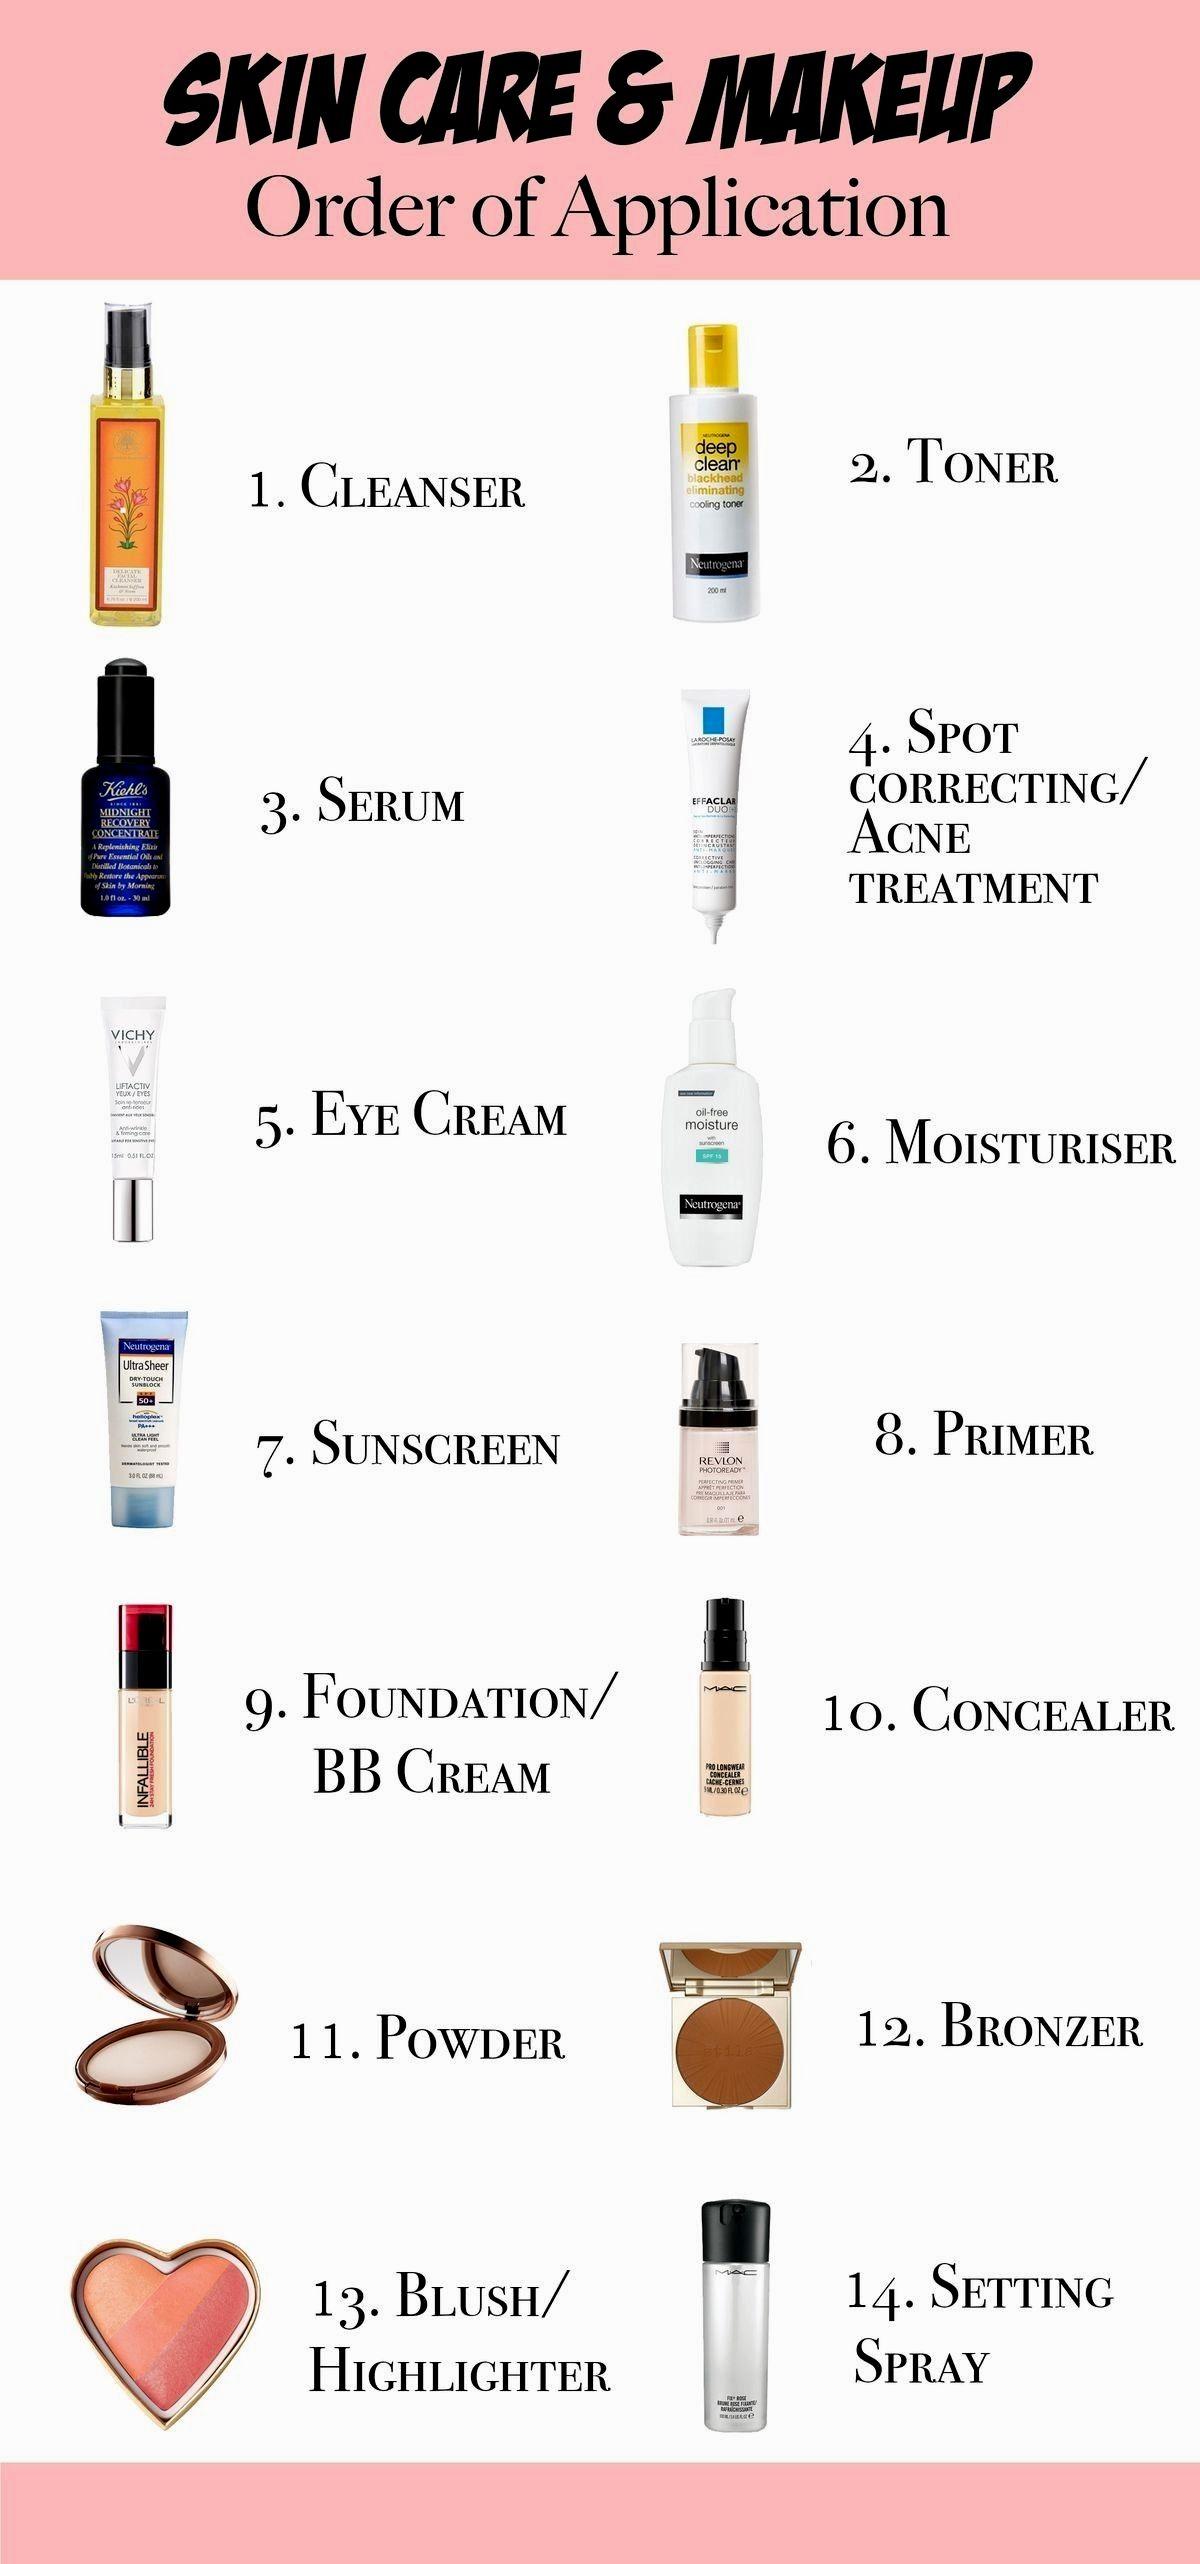 dyi skin care Makeup order, Skin care order, Skin care